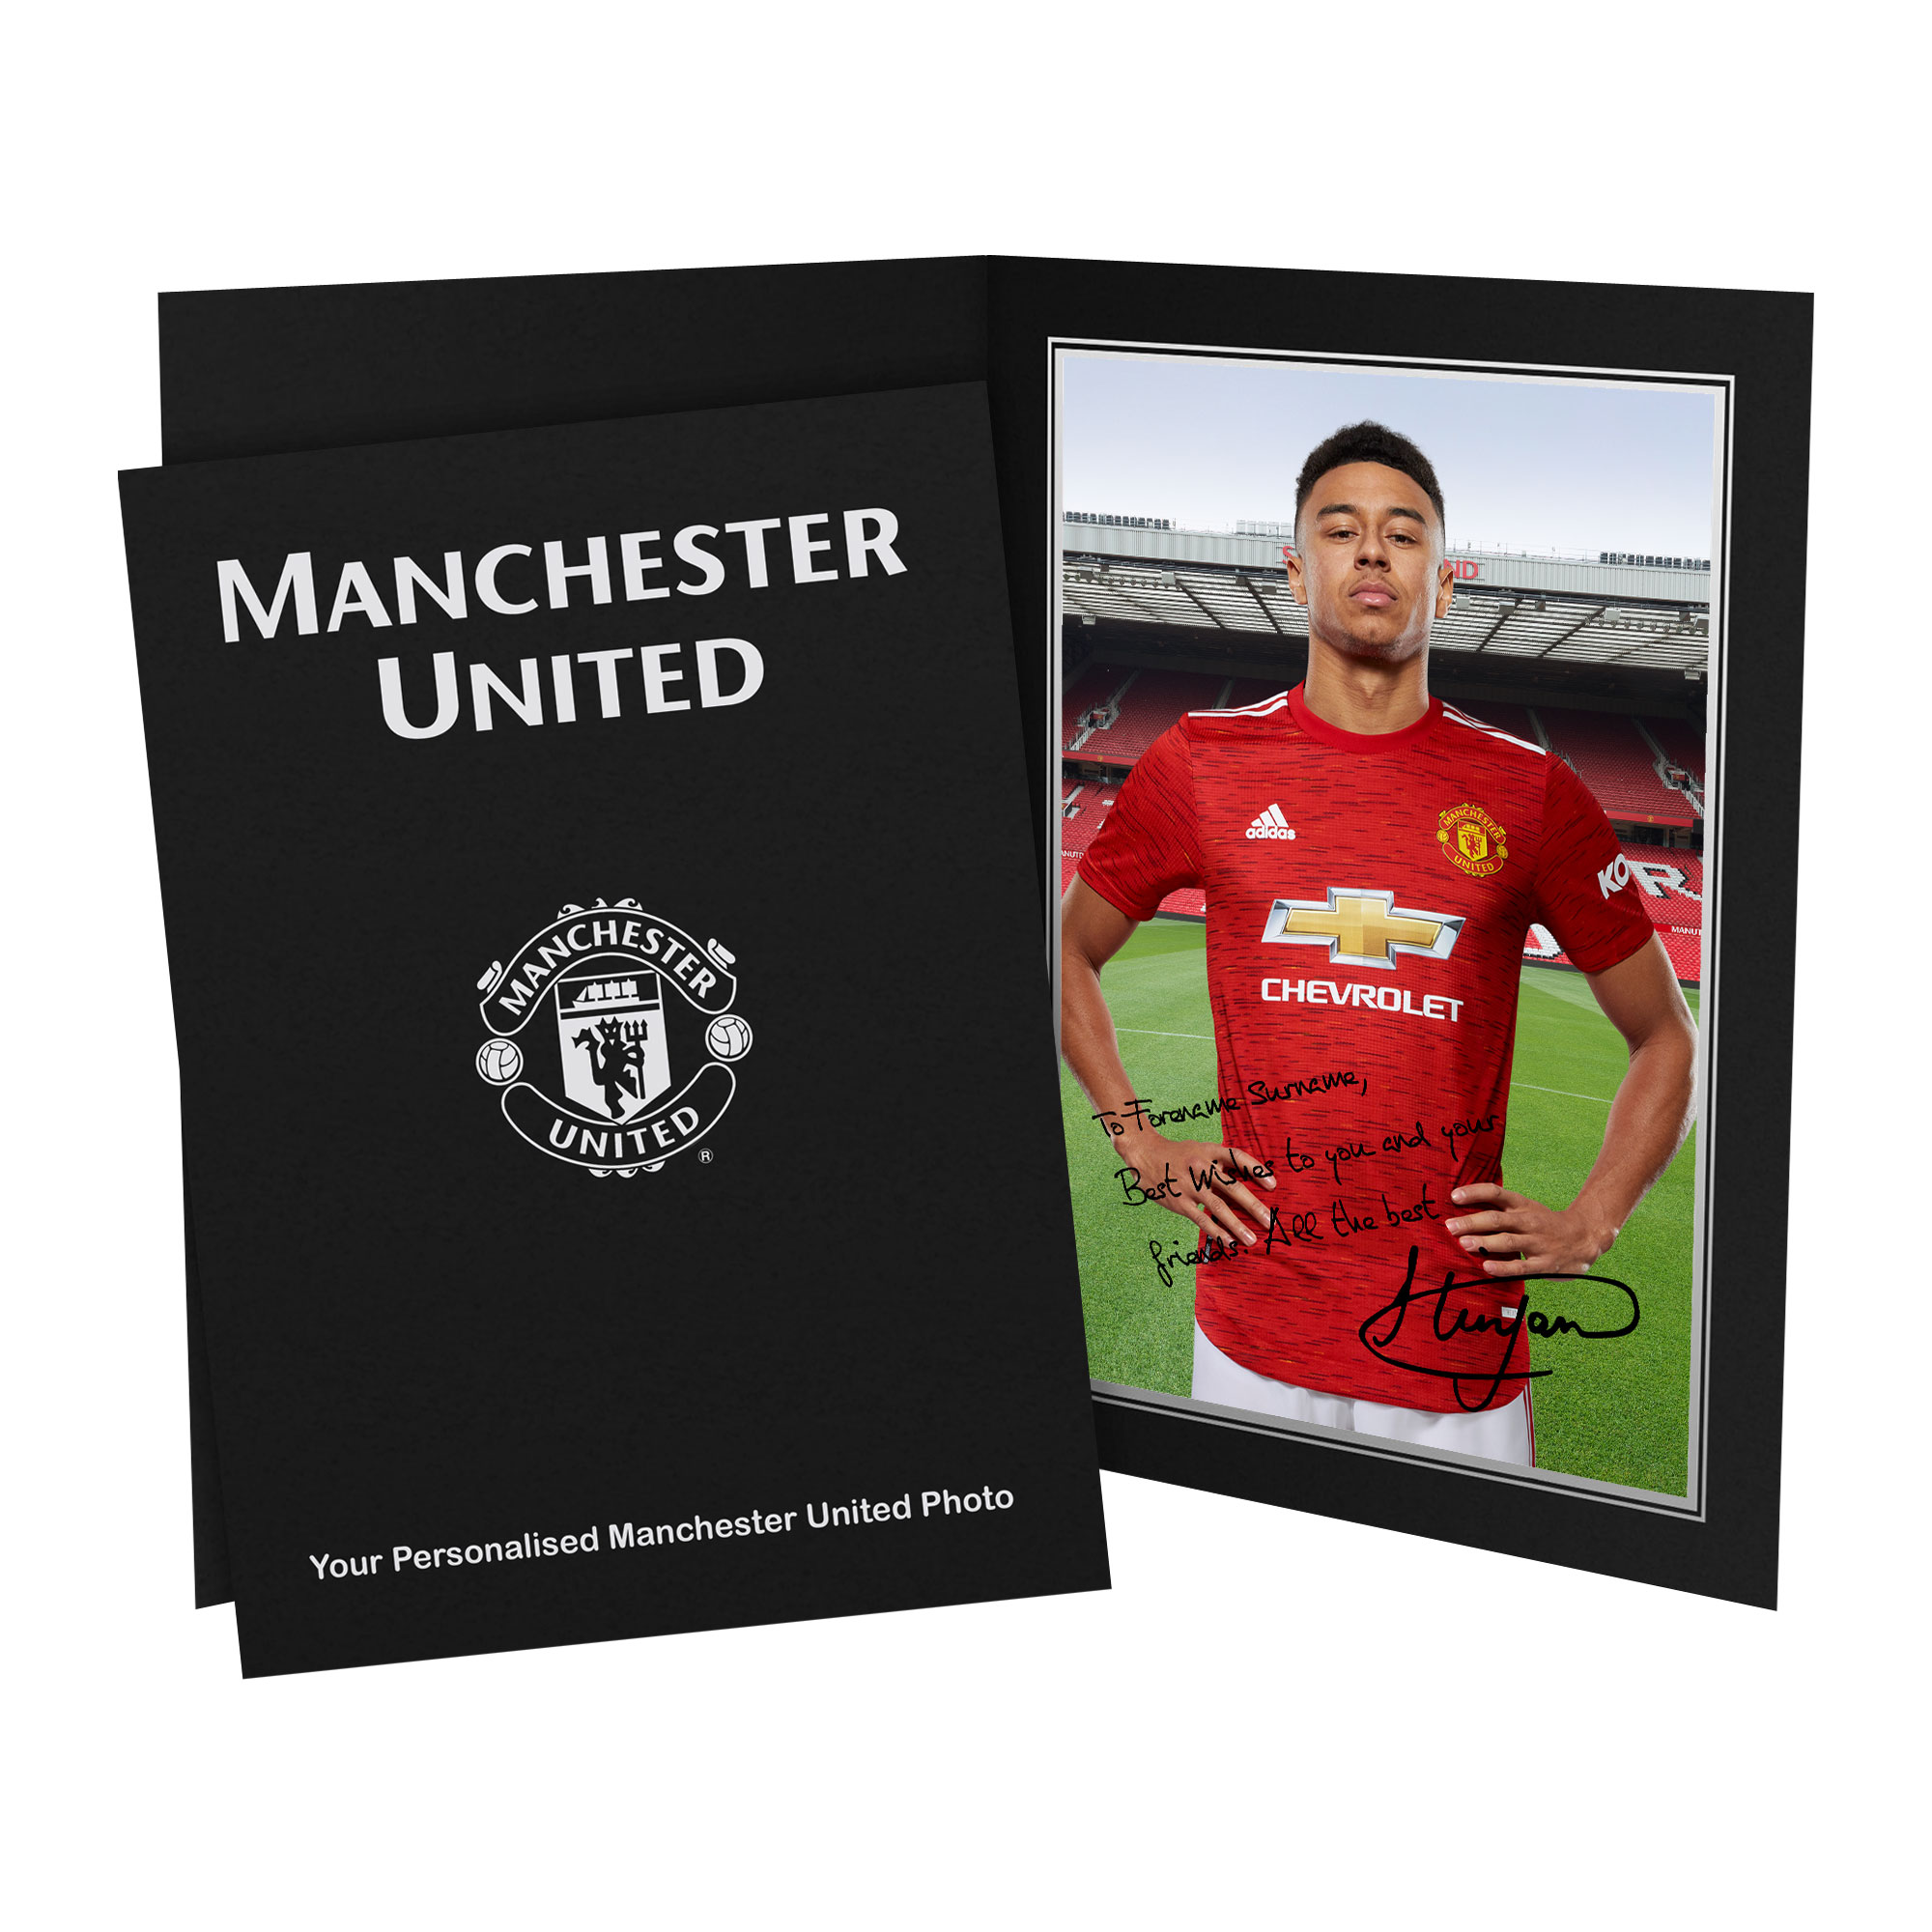 Manchester United FC Lingard Autograph Photo Folder